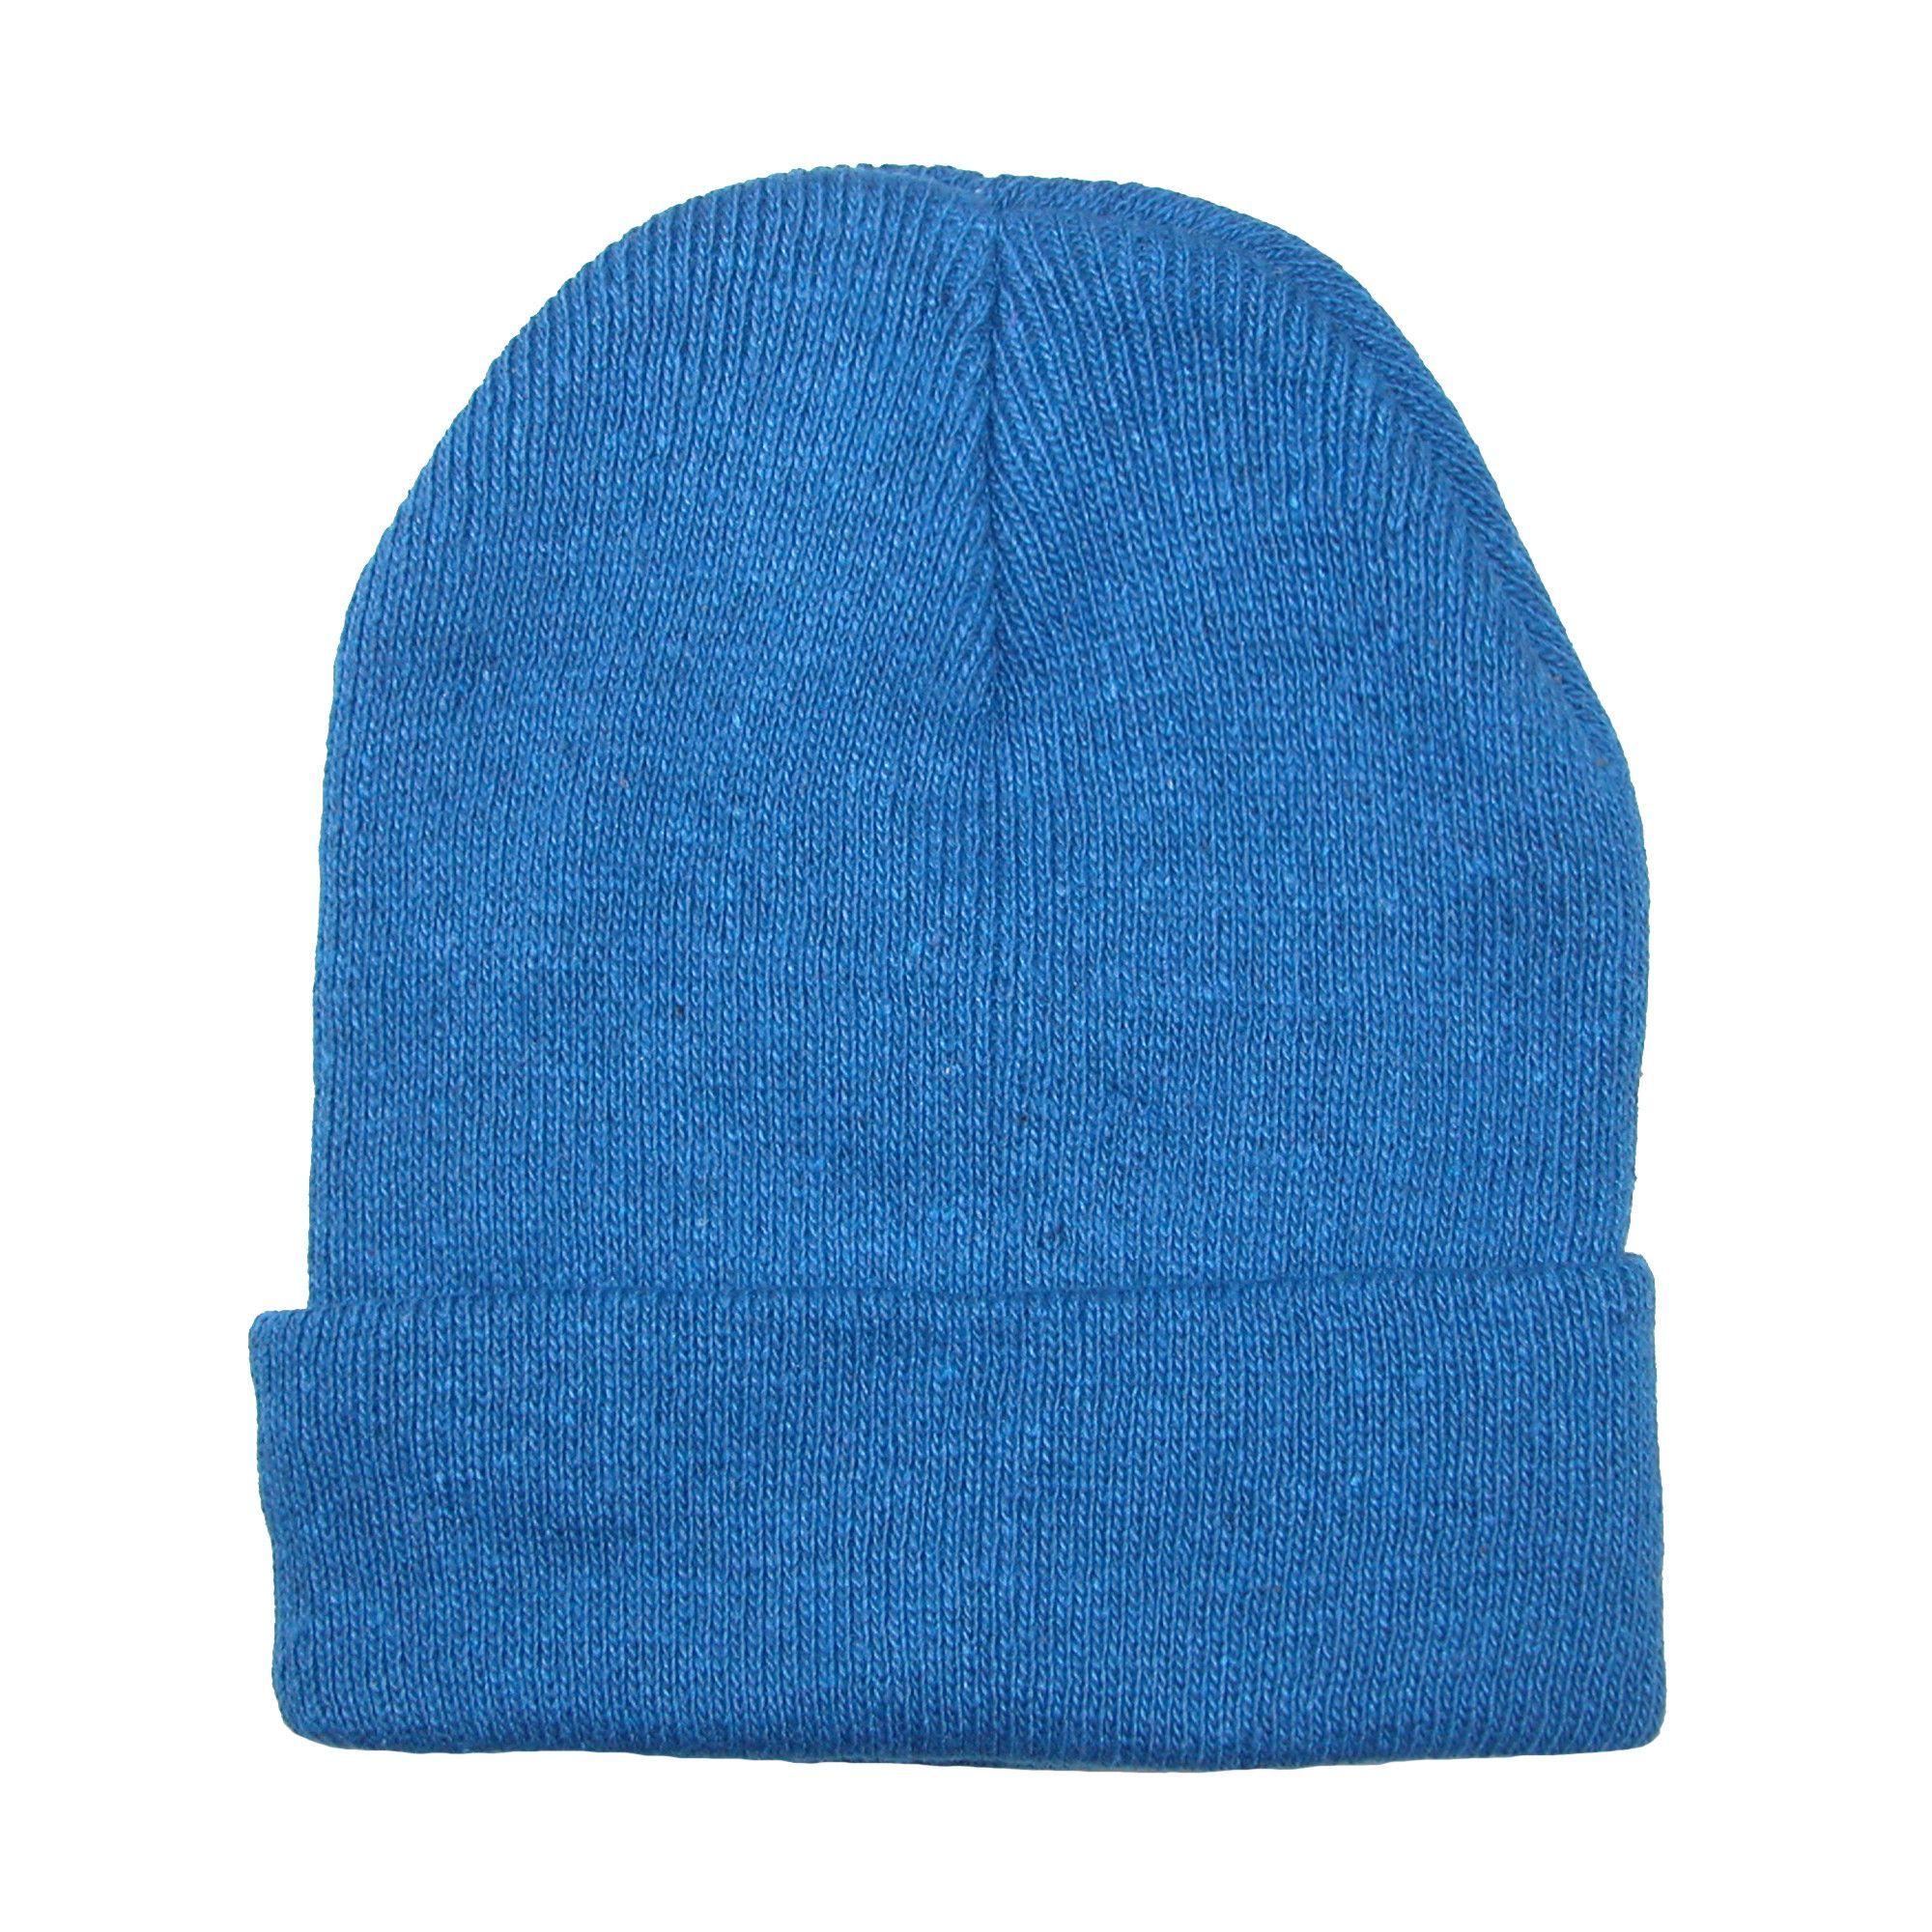 CTM Kids' Knit Winter Cuff Stocking Cap